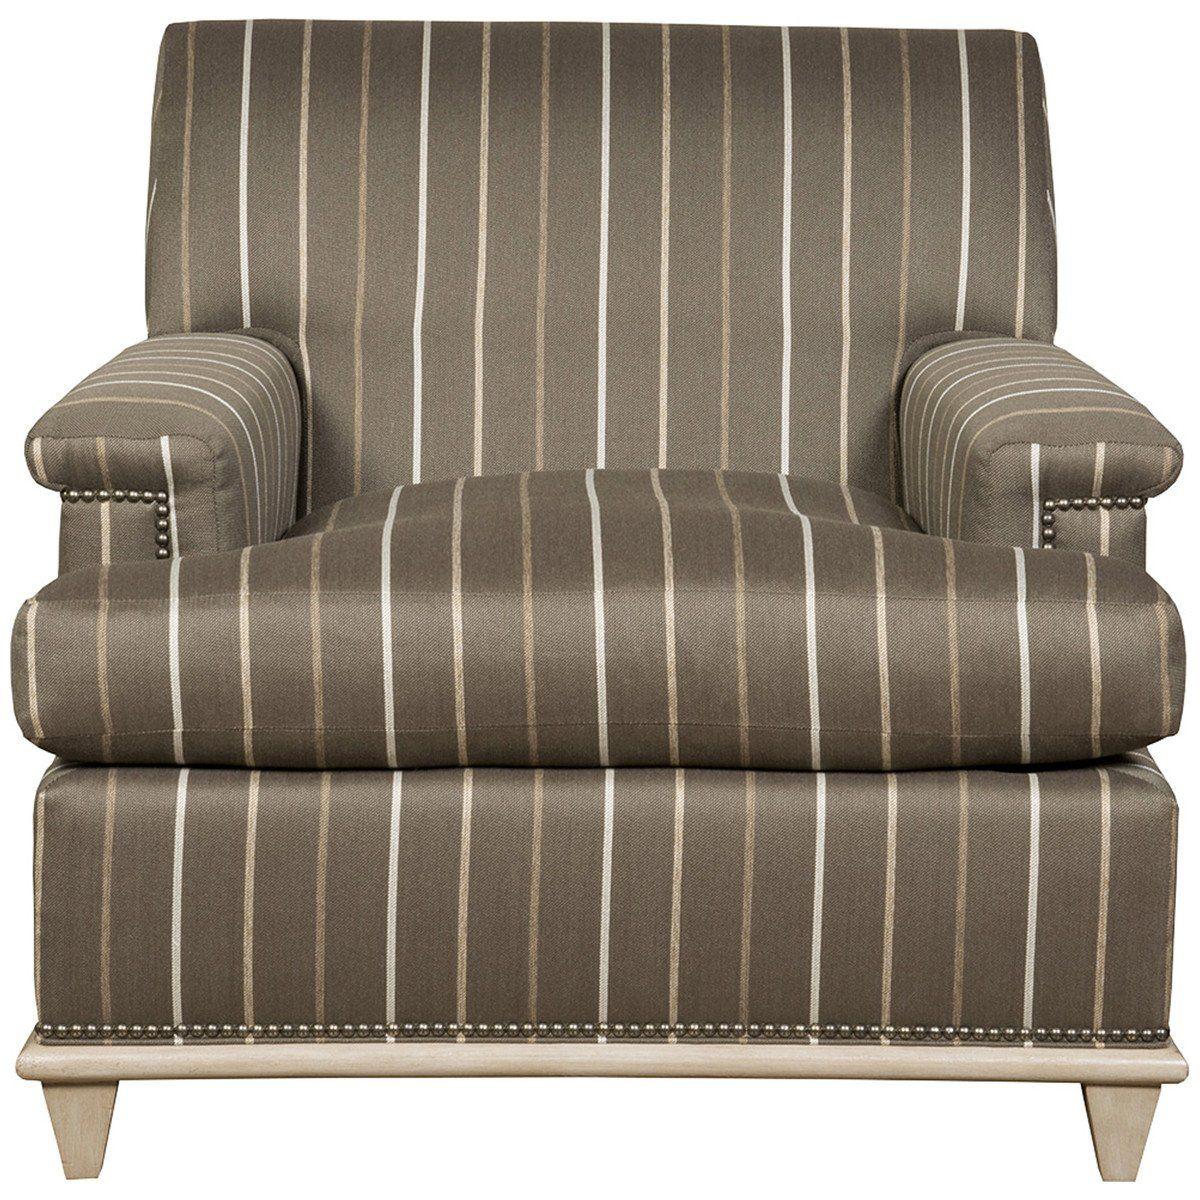 vanguard furniture pierce chair v318 ch products in 2018 rh pinterest com